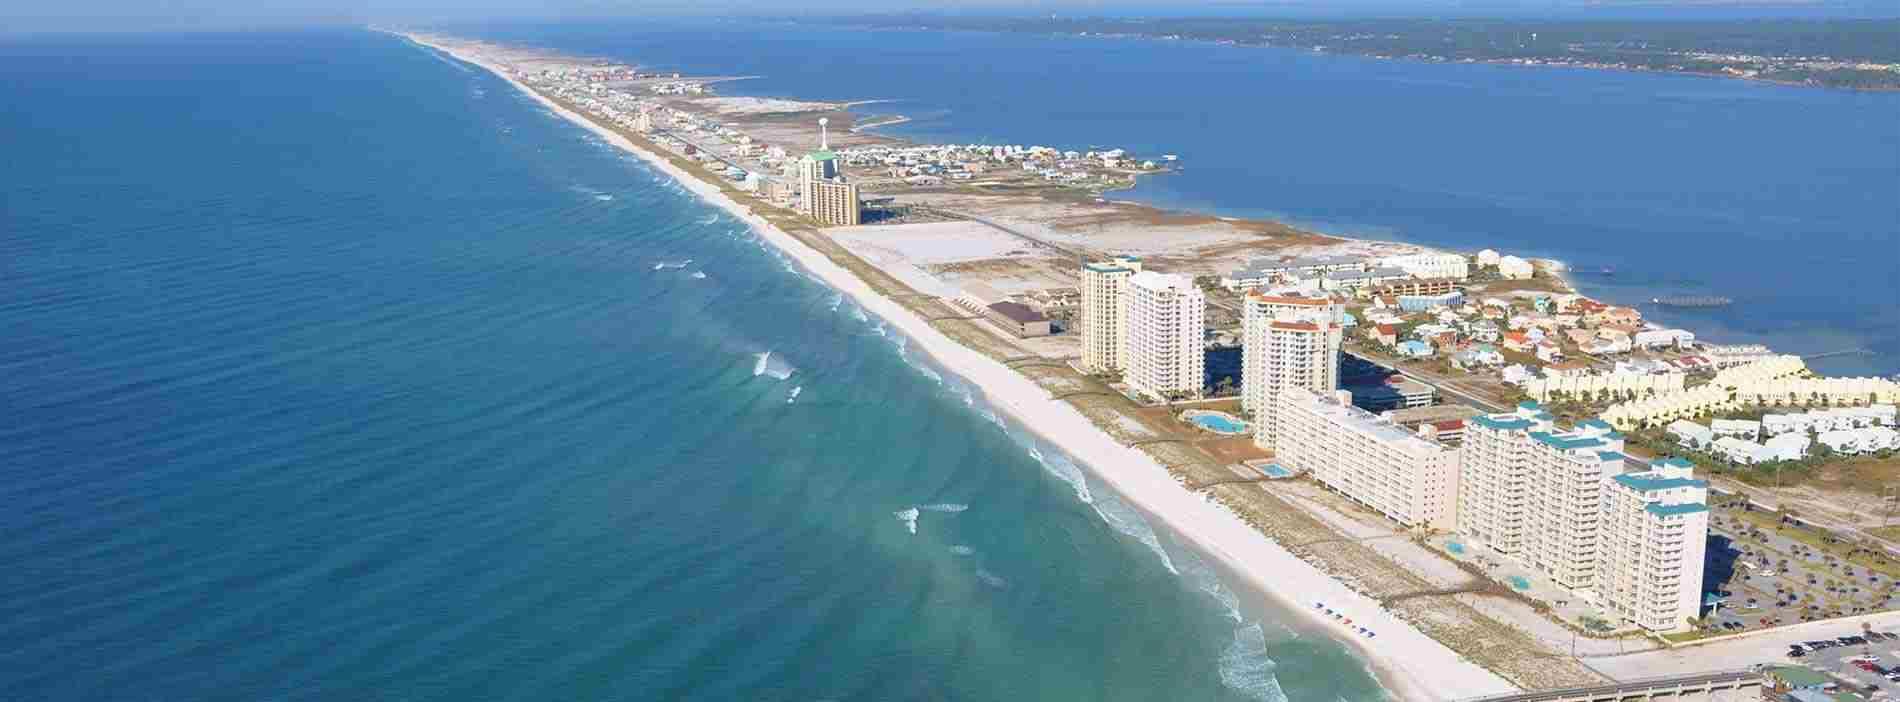 Beach Rentals At Navarre | Vacation Rentals Navarre Beach - Navarre Beach Florida Map